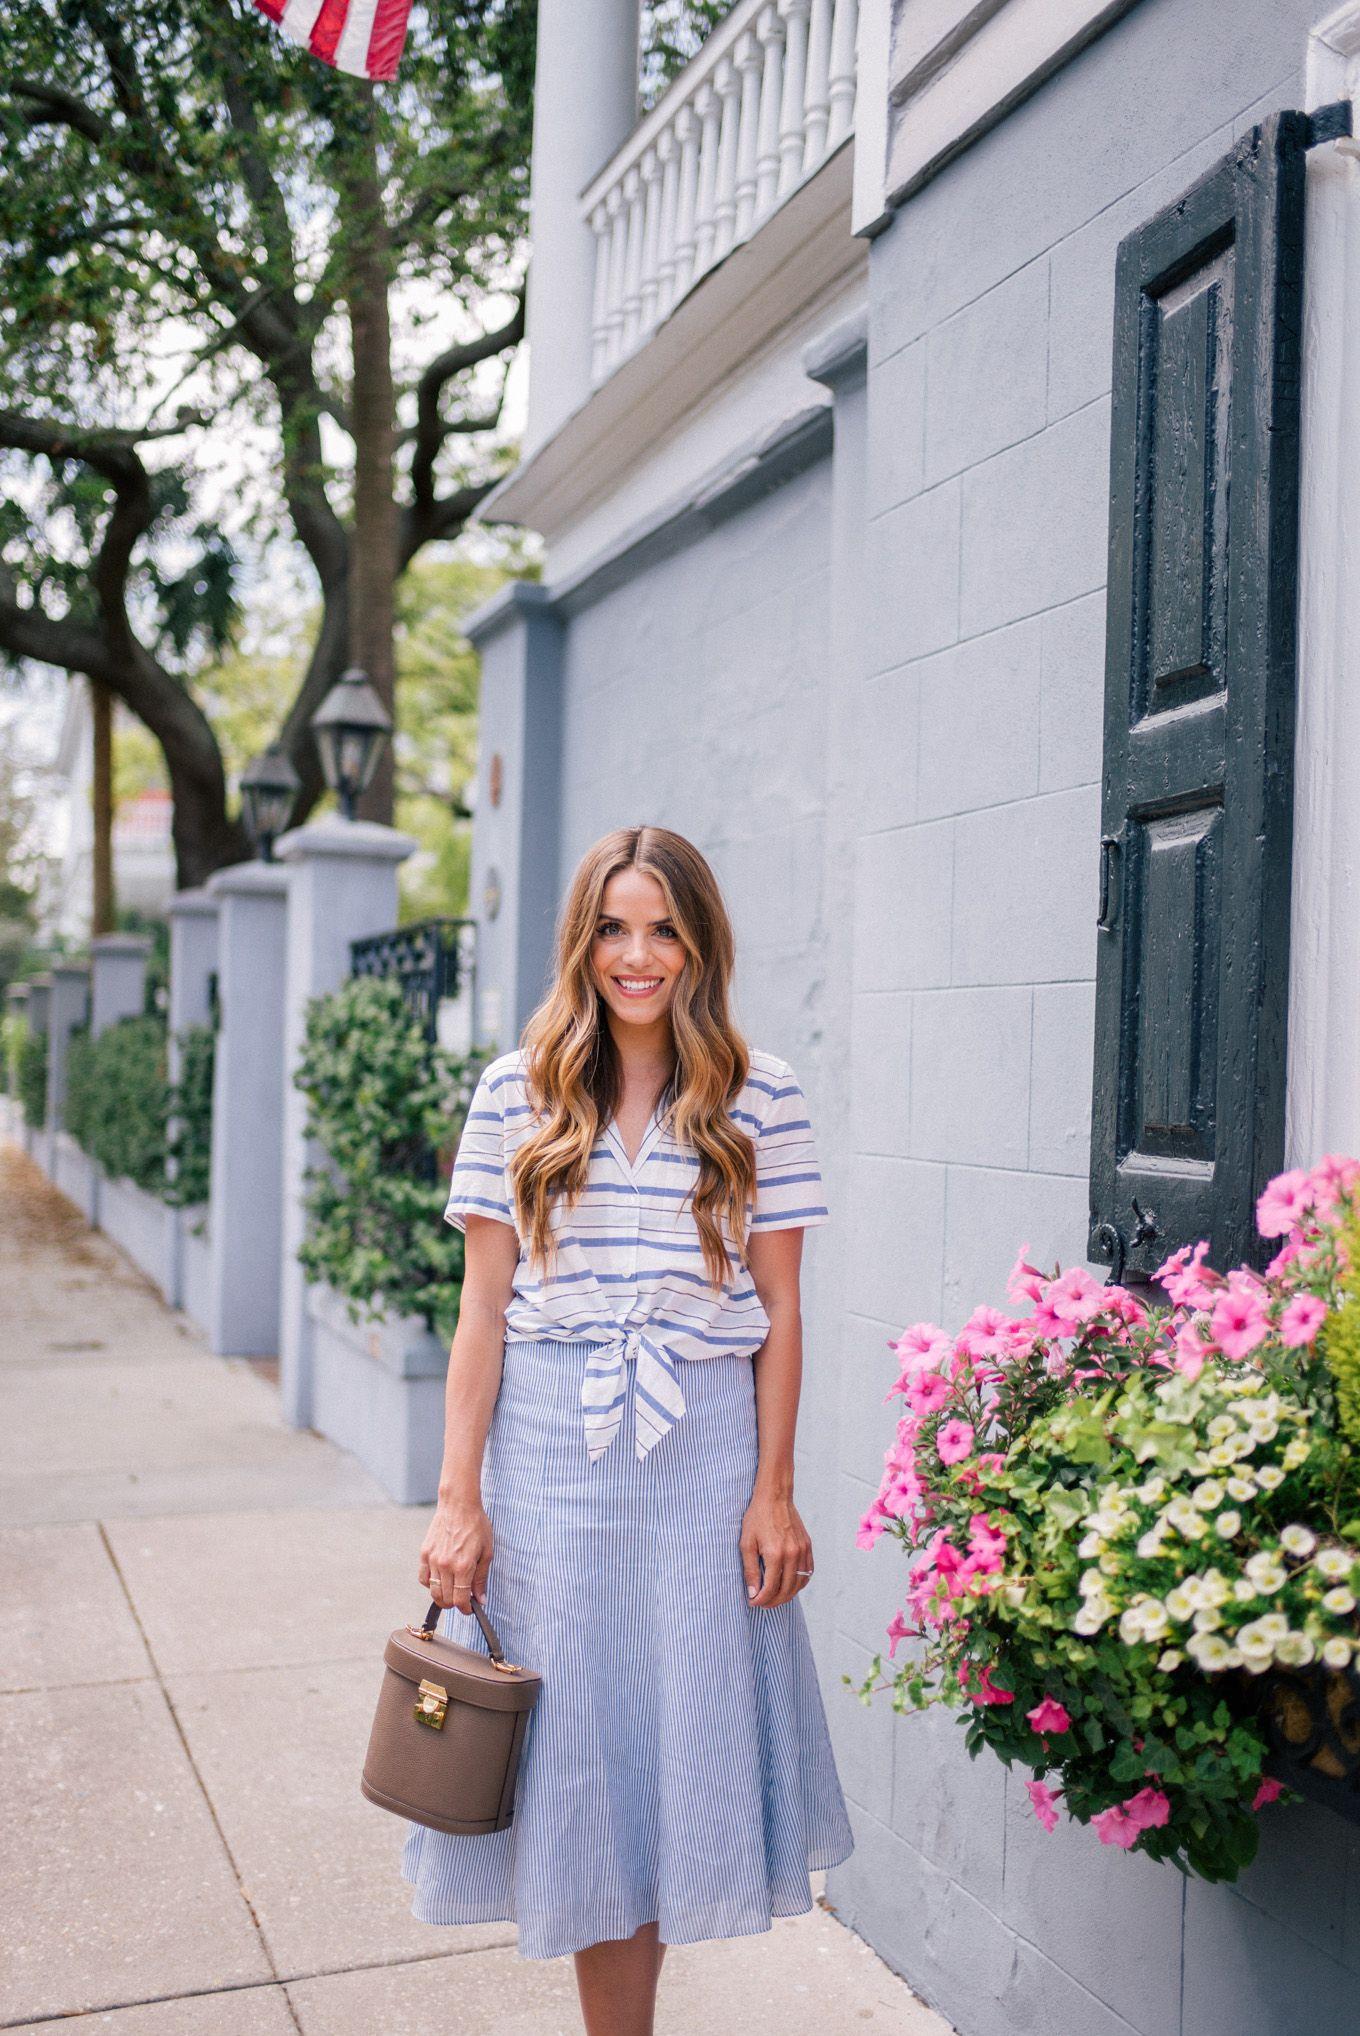 Outfit details equipment top nordstrom skirt joie heels mark